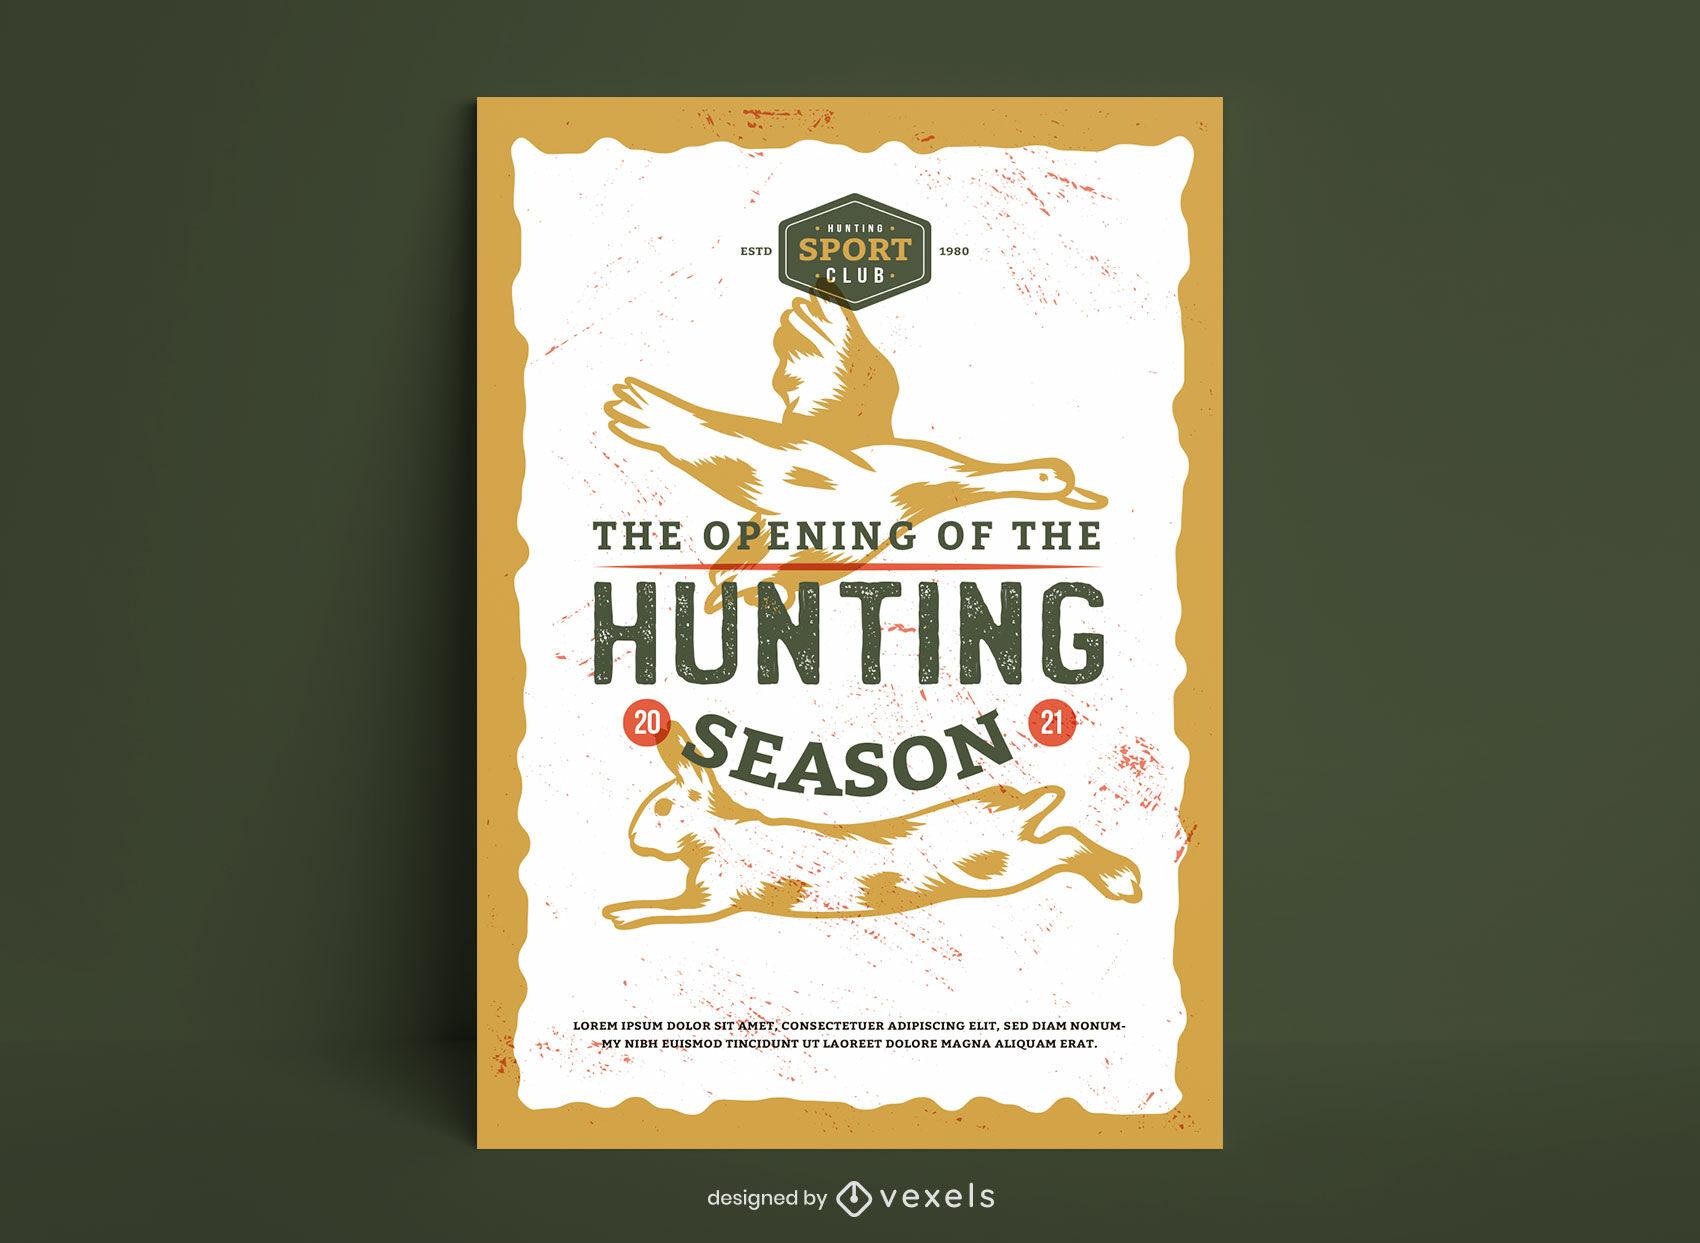 Animal hunting season poster design